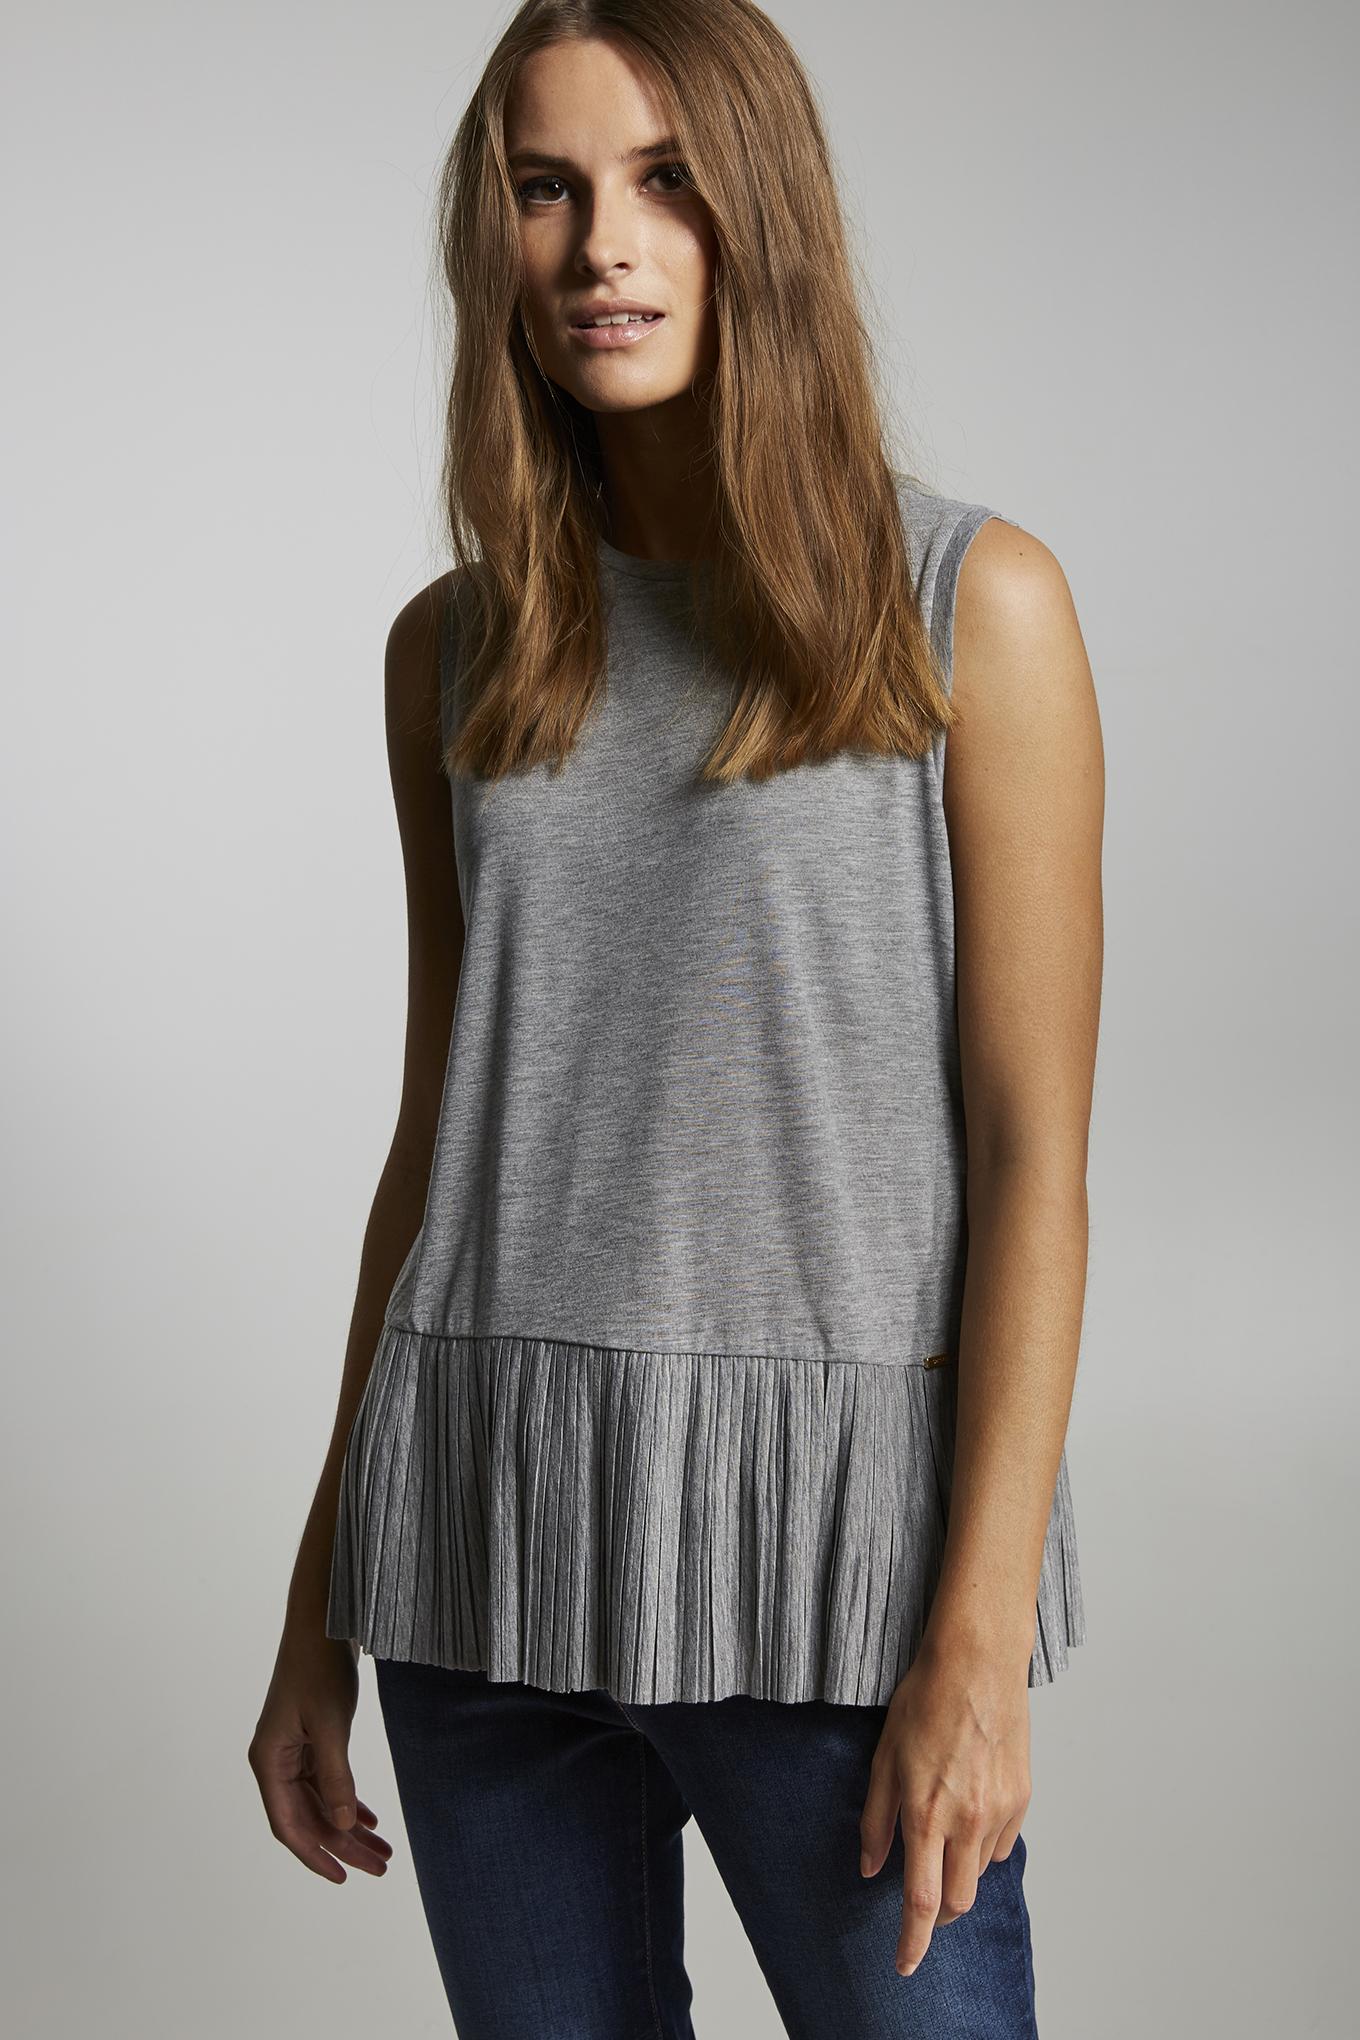 T-Shirt Cinza Mesclado Casual Mulher